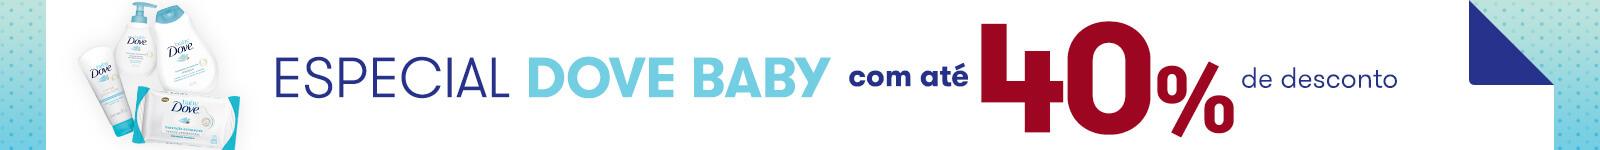 Descontos Imperdíveis: Dove Baby